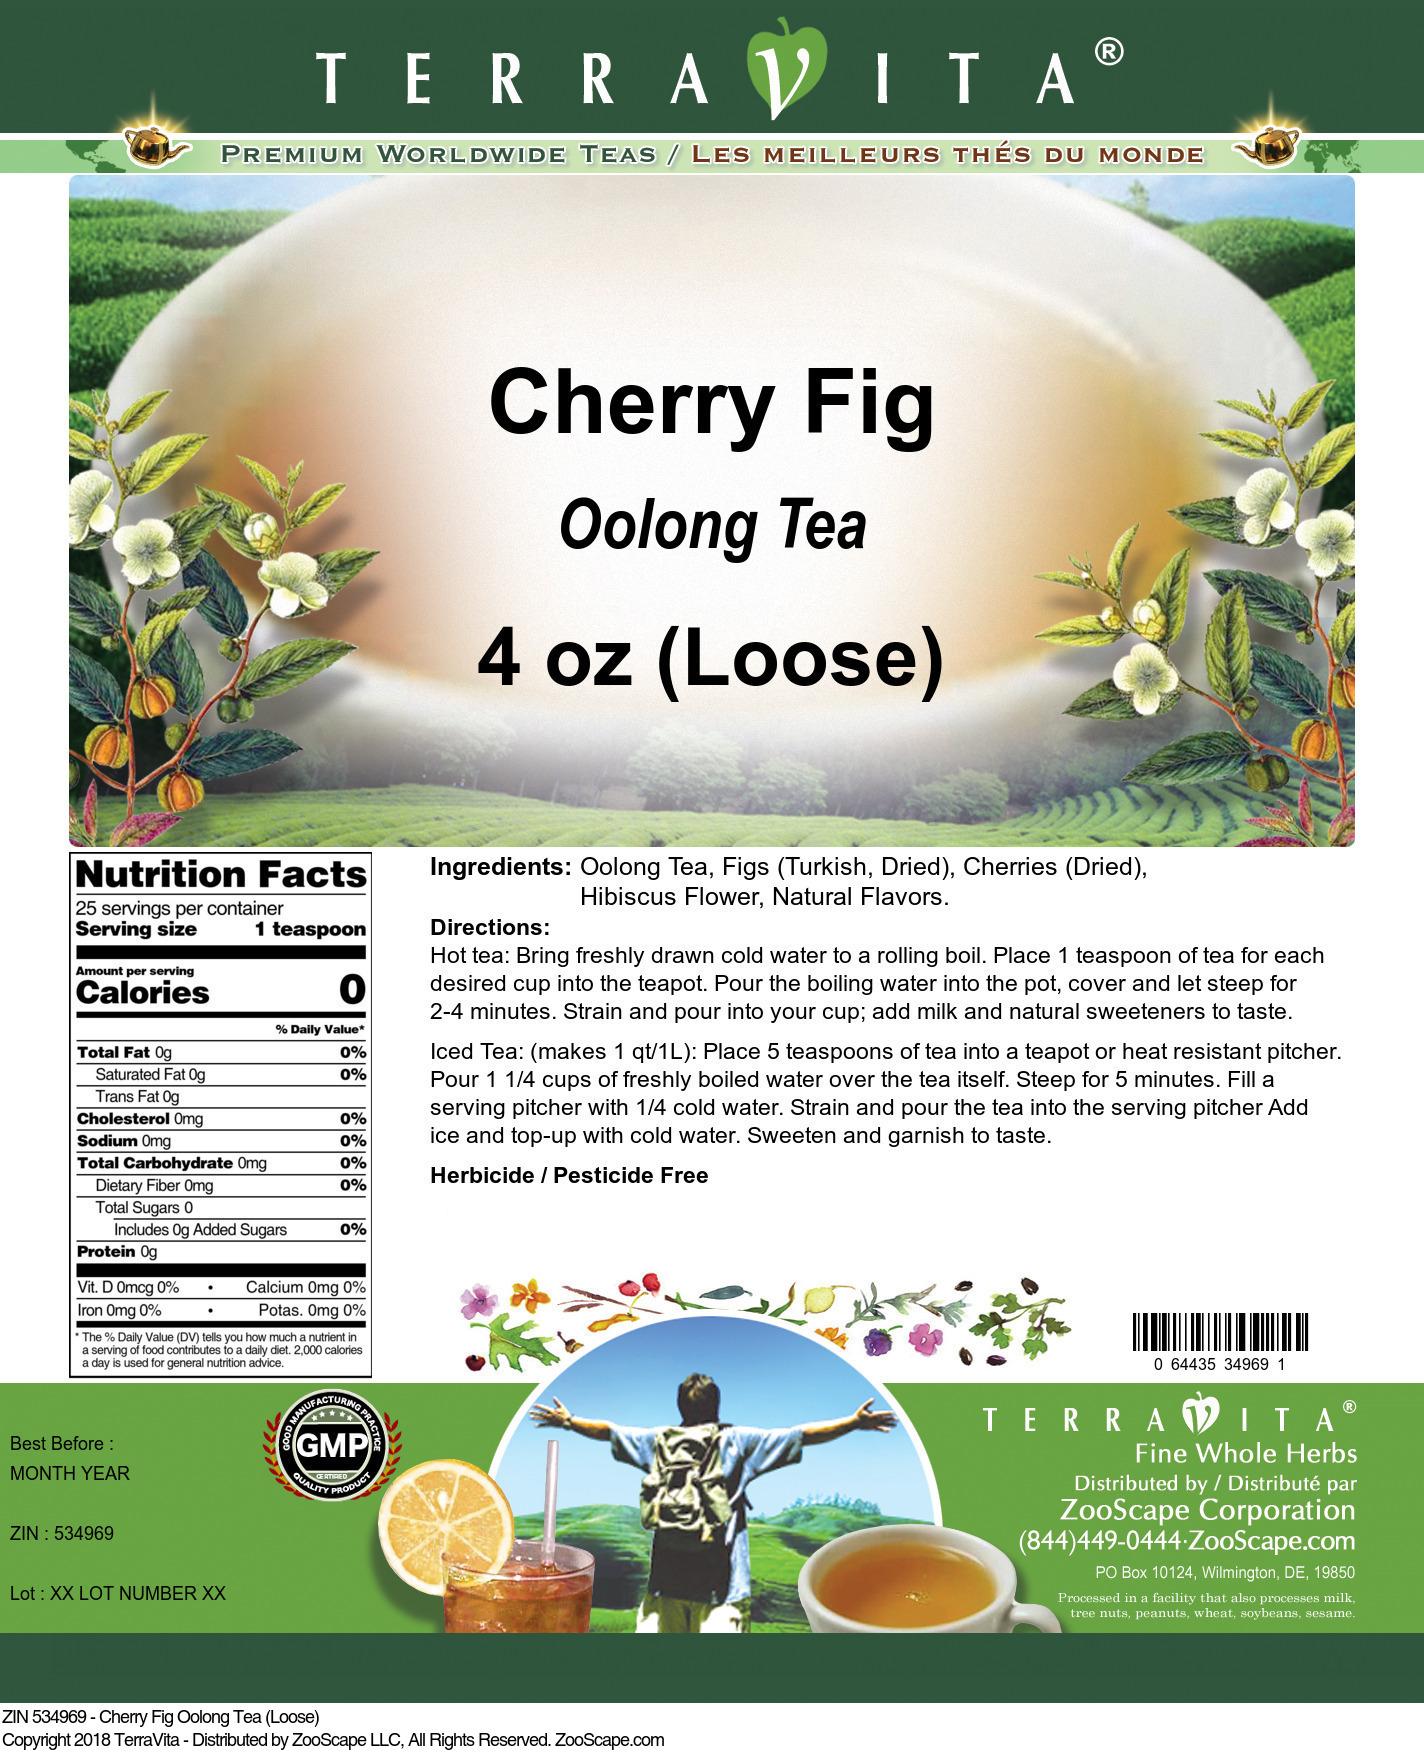 Cherry Fig Oolong Tea (Loose)